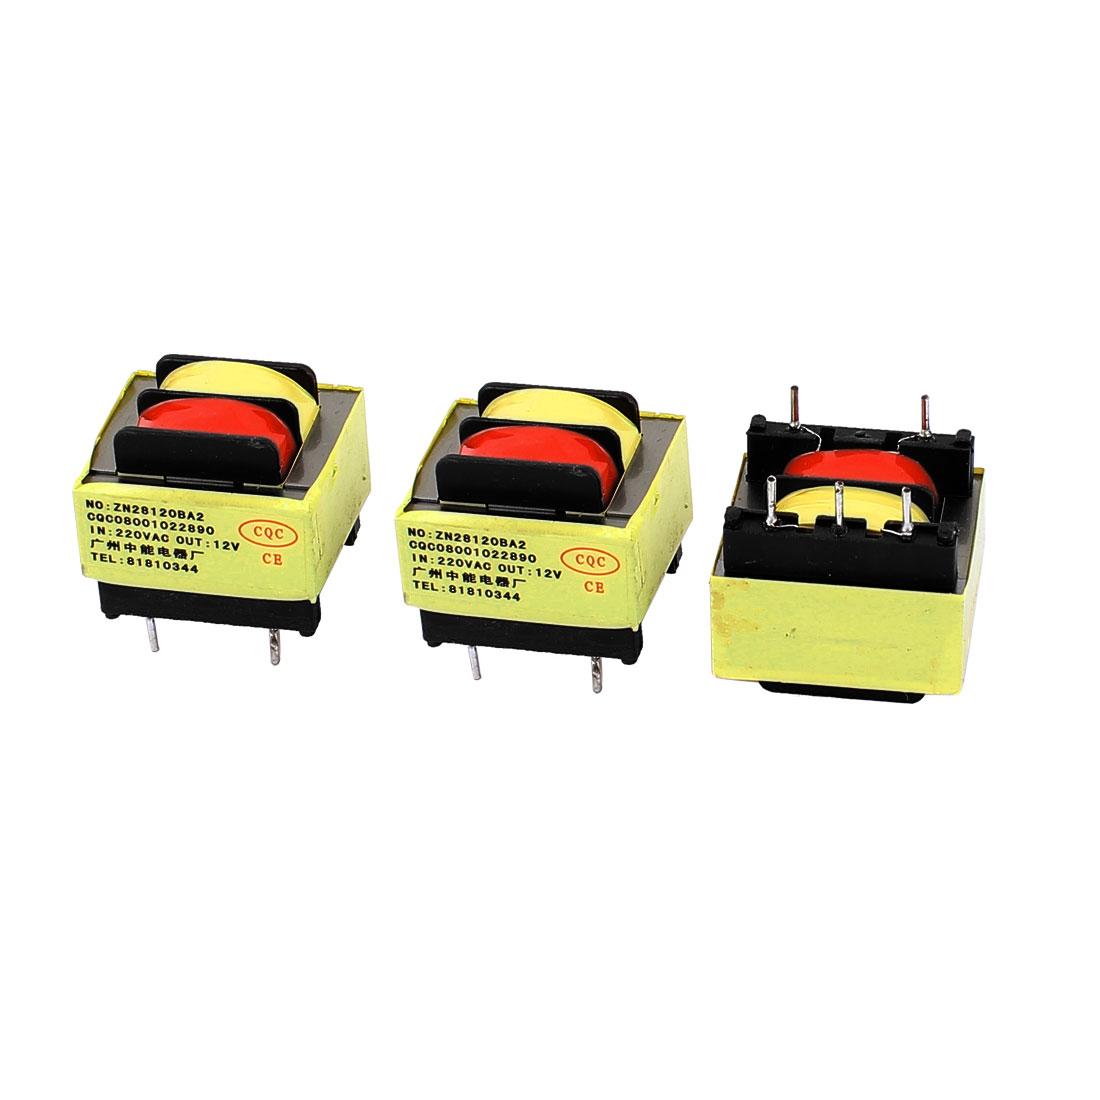 3Pcs 220V Input 12V 1.2VA Output Yellow Red Ferrite Core Power Transformer w 5 Terminals